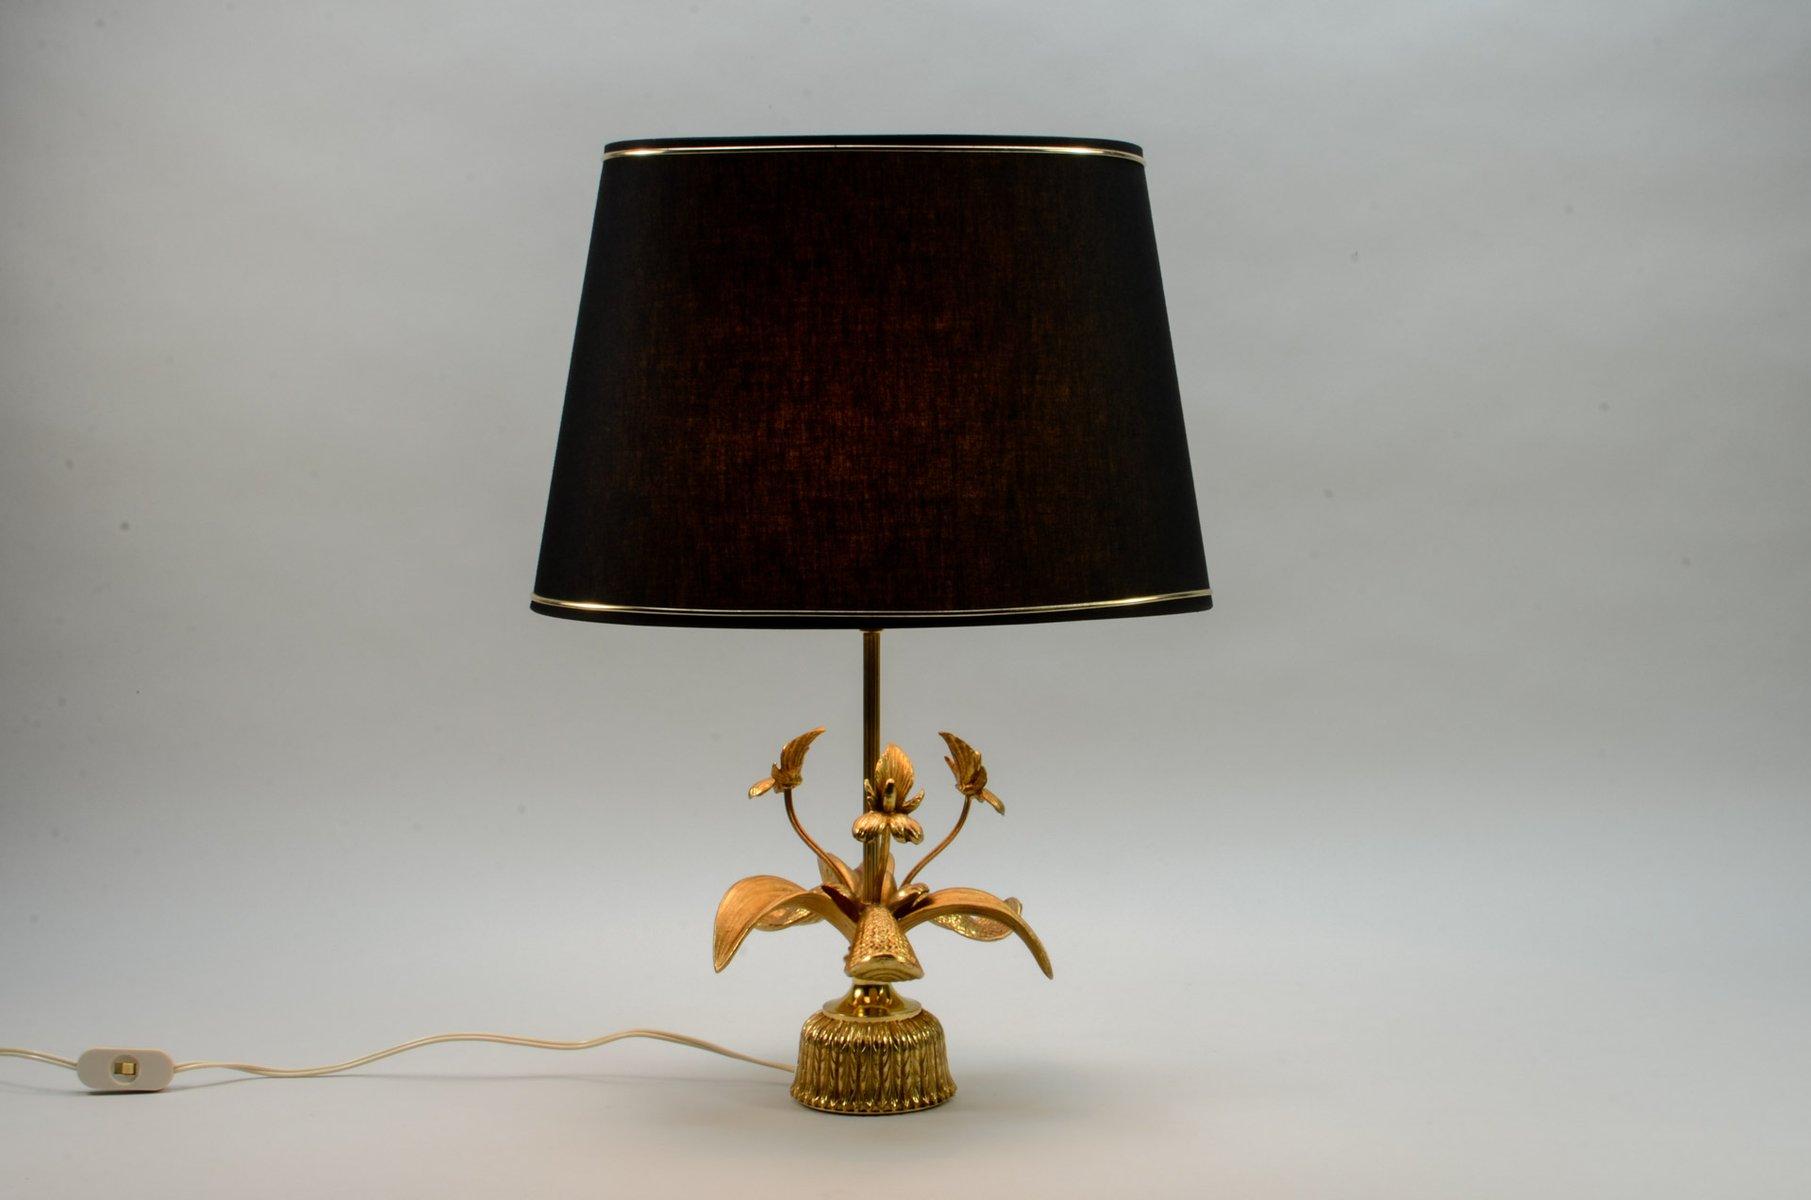 Mid Century Brass Fleur De Lis Table Lamp 1960s For Sale At Pamono